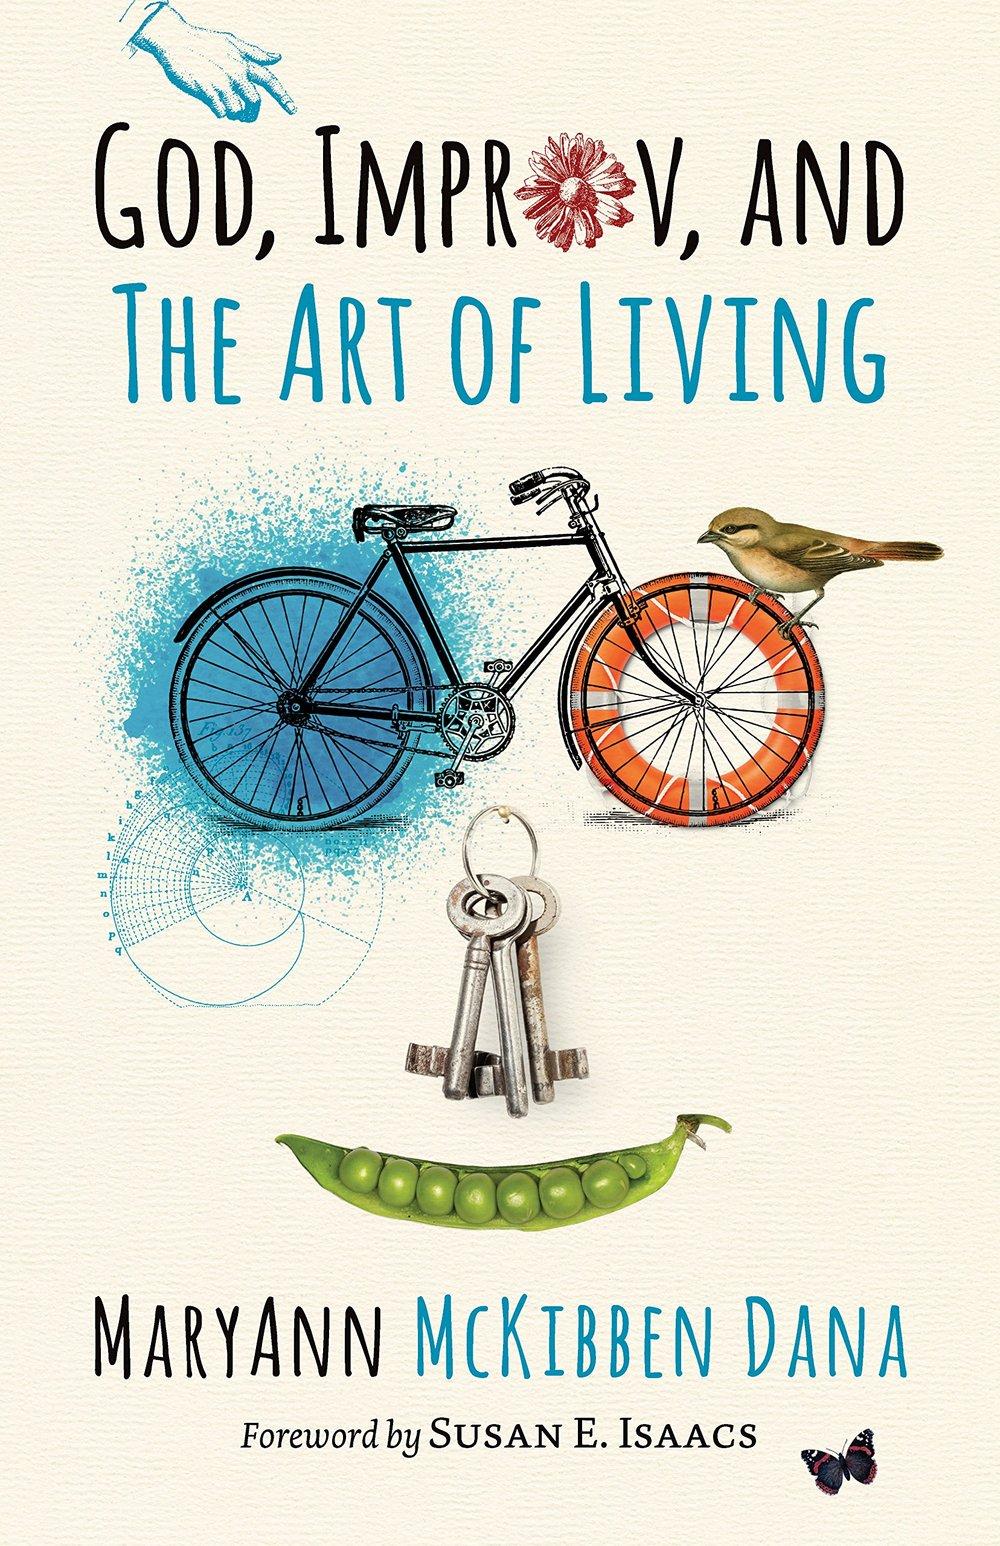 MaryAnn McKibben Dana: God, Improv, and the Art of Living book (autographed)